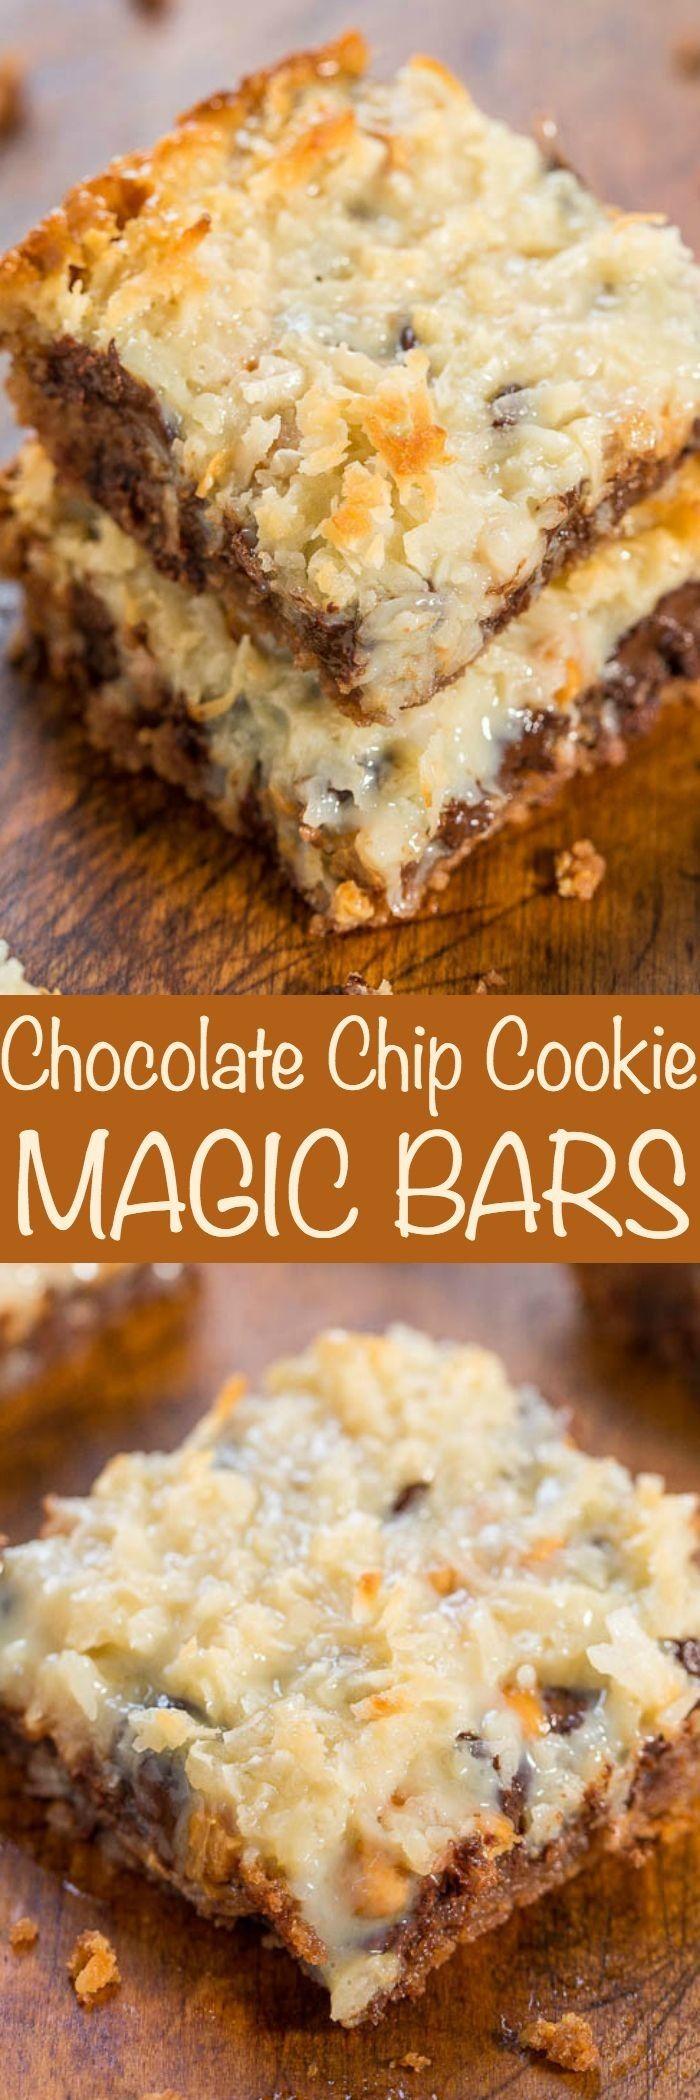 Chocolate Chip Cookie Magic Bars | CookJino